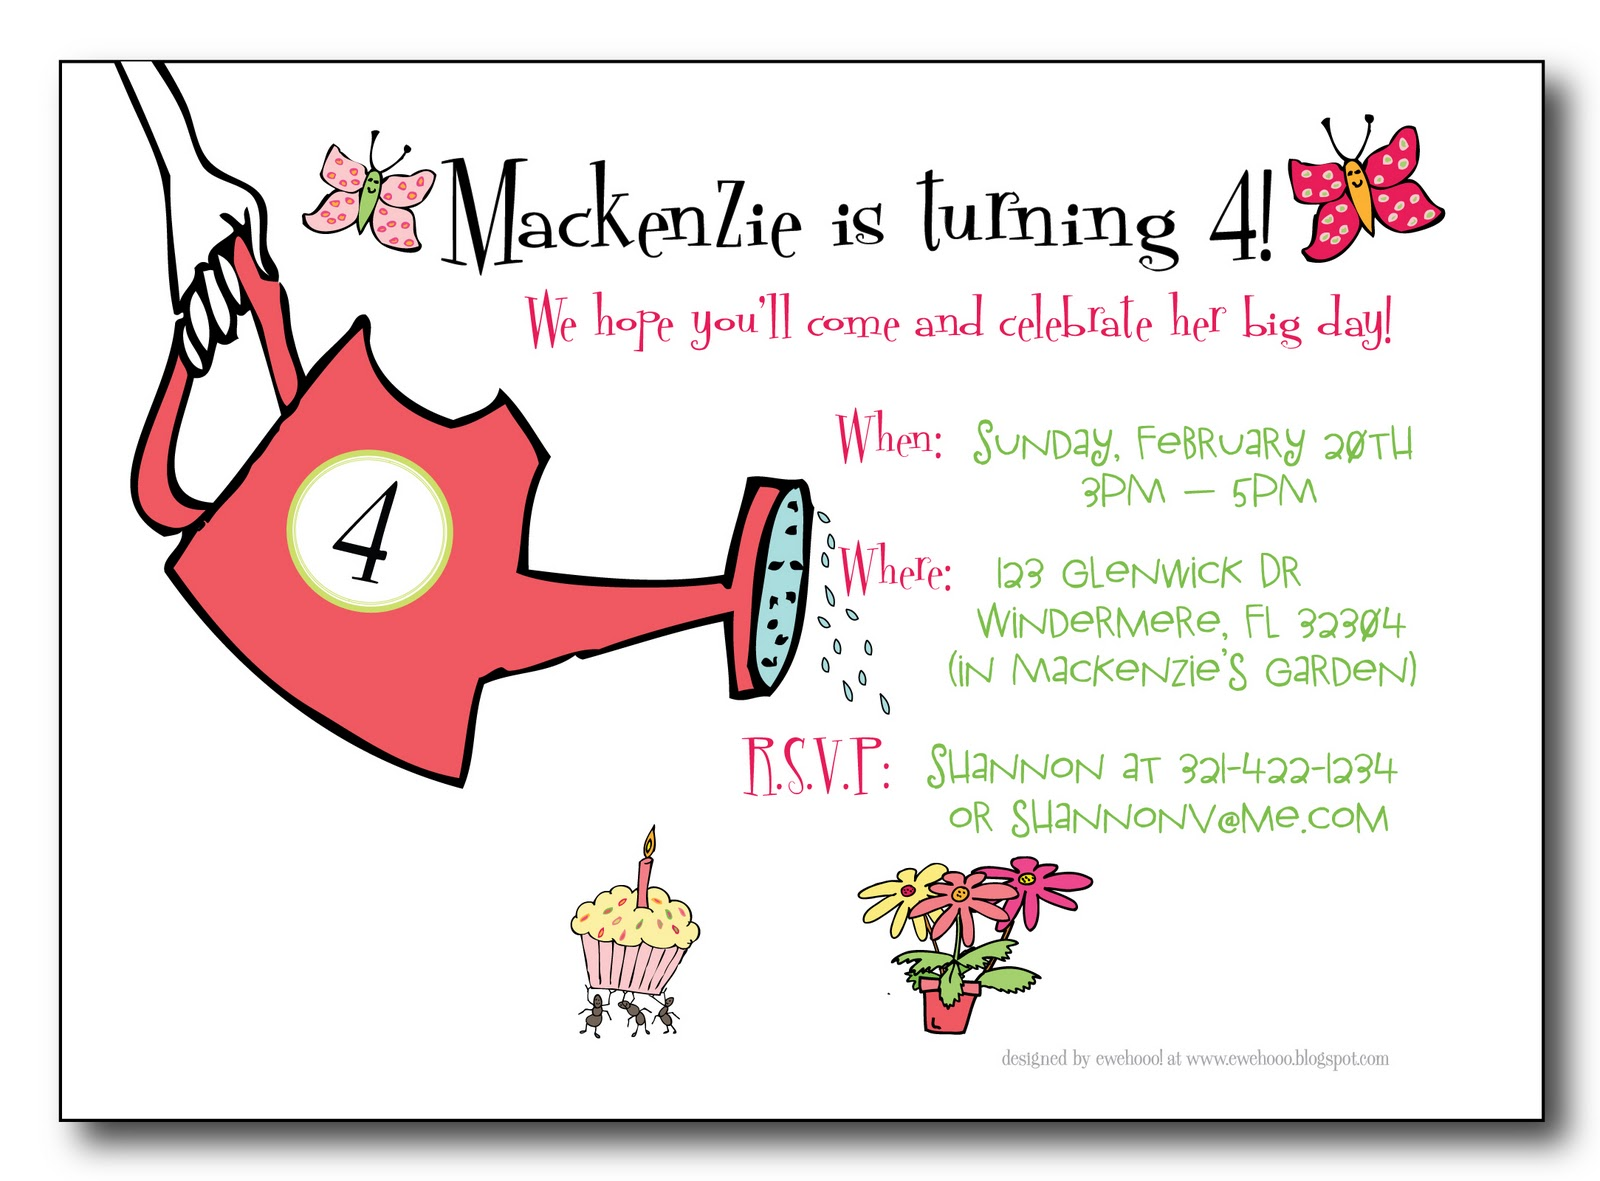 ewe hooo A Garden Birthday Party for Mackenzie – Garden Birthday Party Invitations